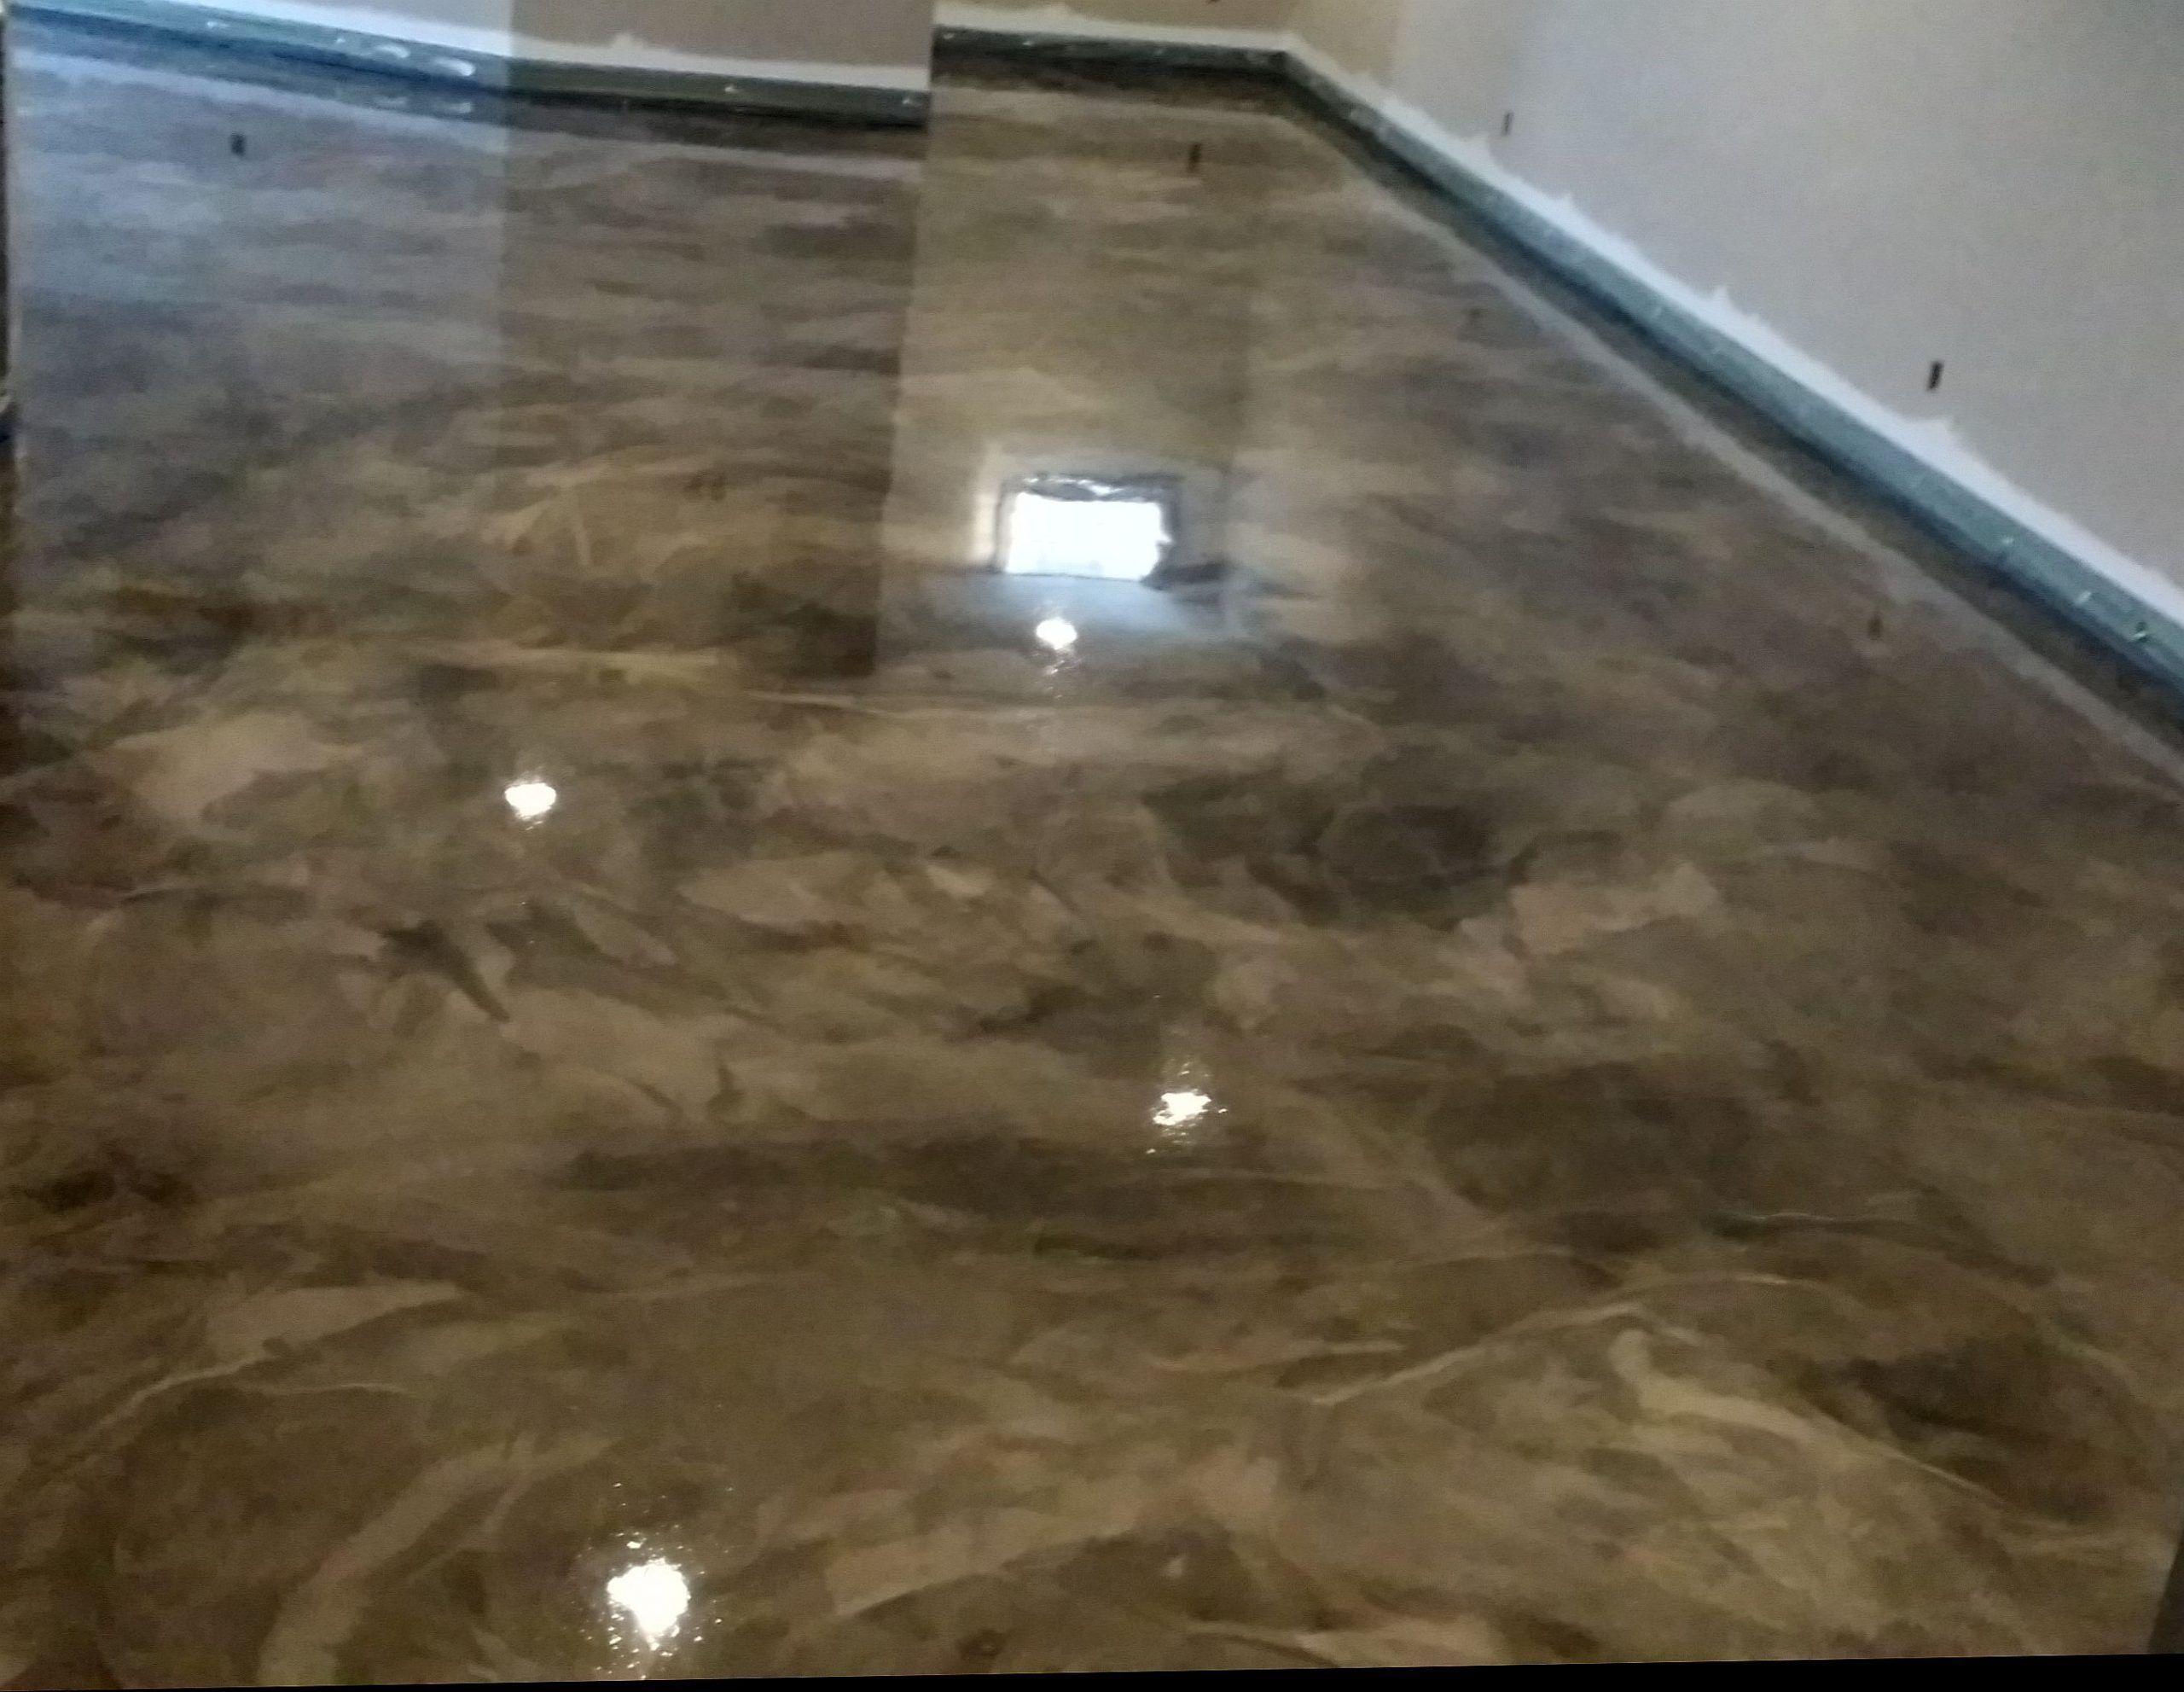 Epoxy Flooring Design Premier Concrete Coatings Concrete Coatings Design Coatings Concrete Design Epoxy Flooring In 2020 Metallic Epoxy Floor Epoxy Floor